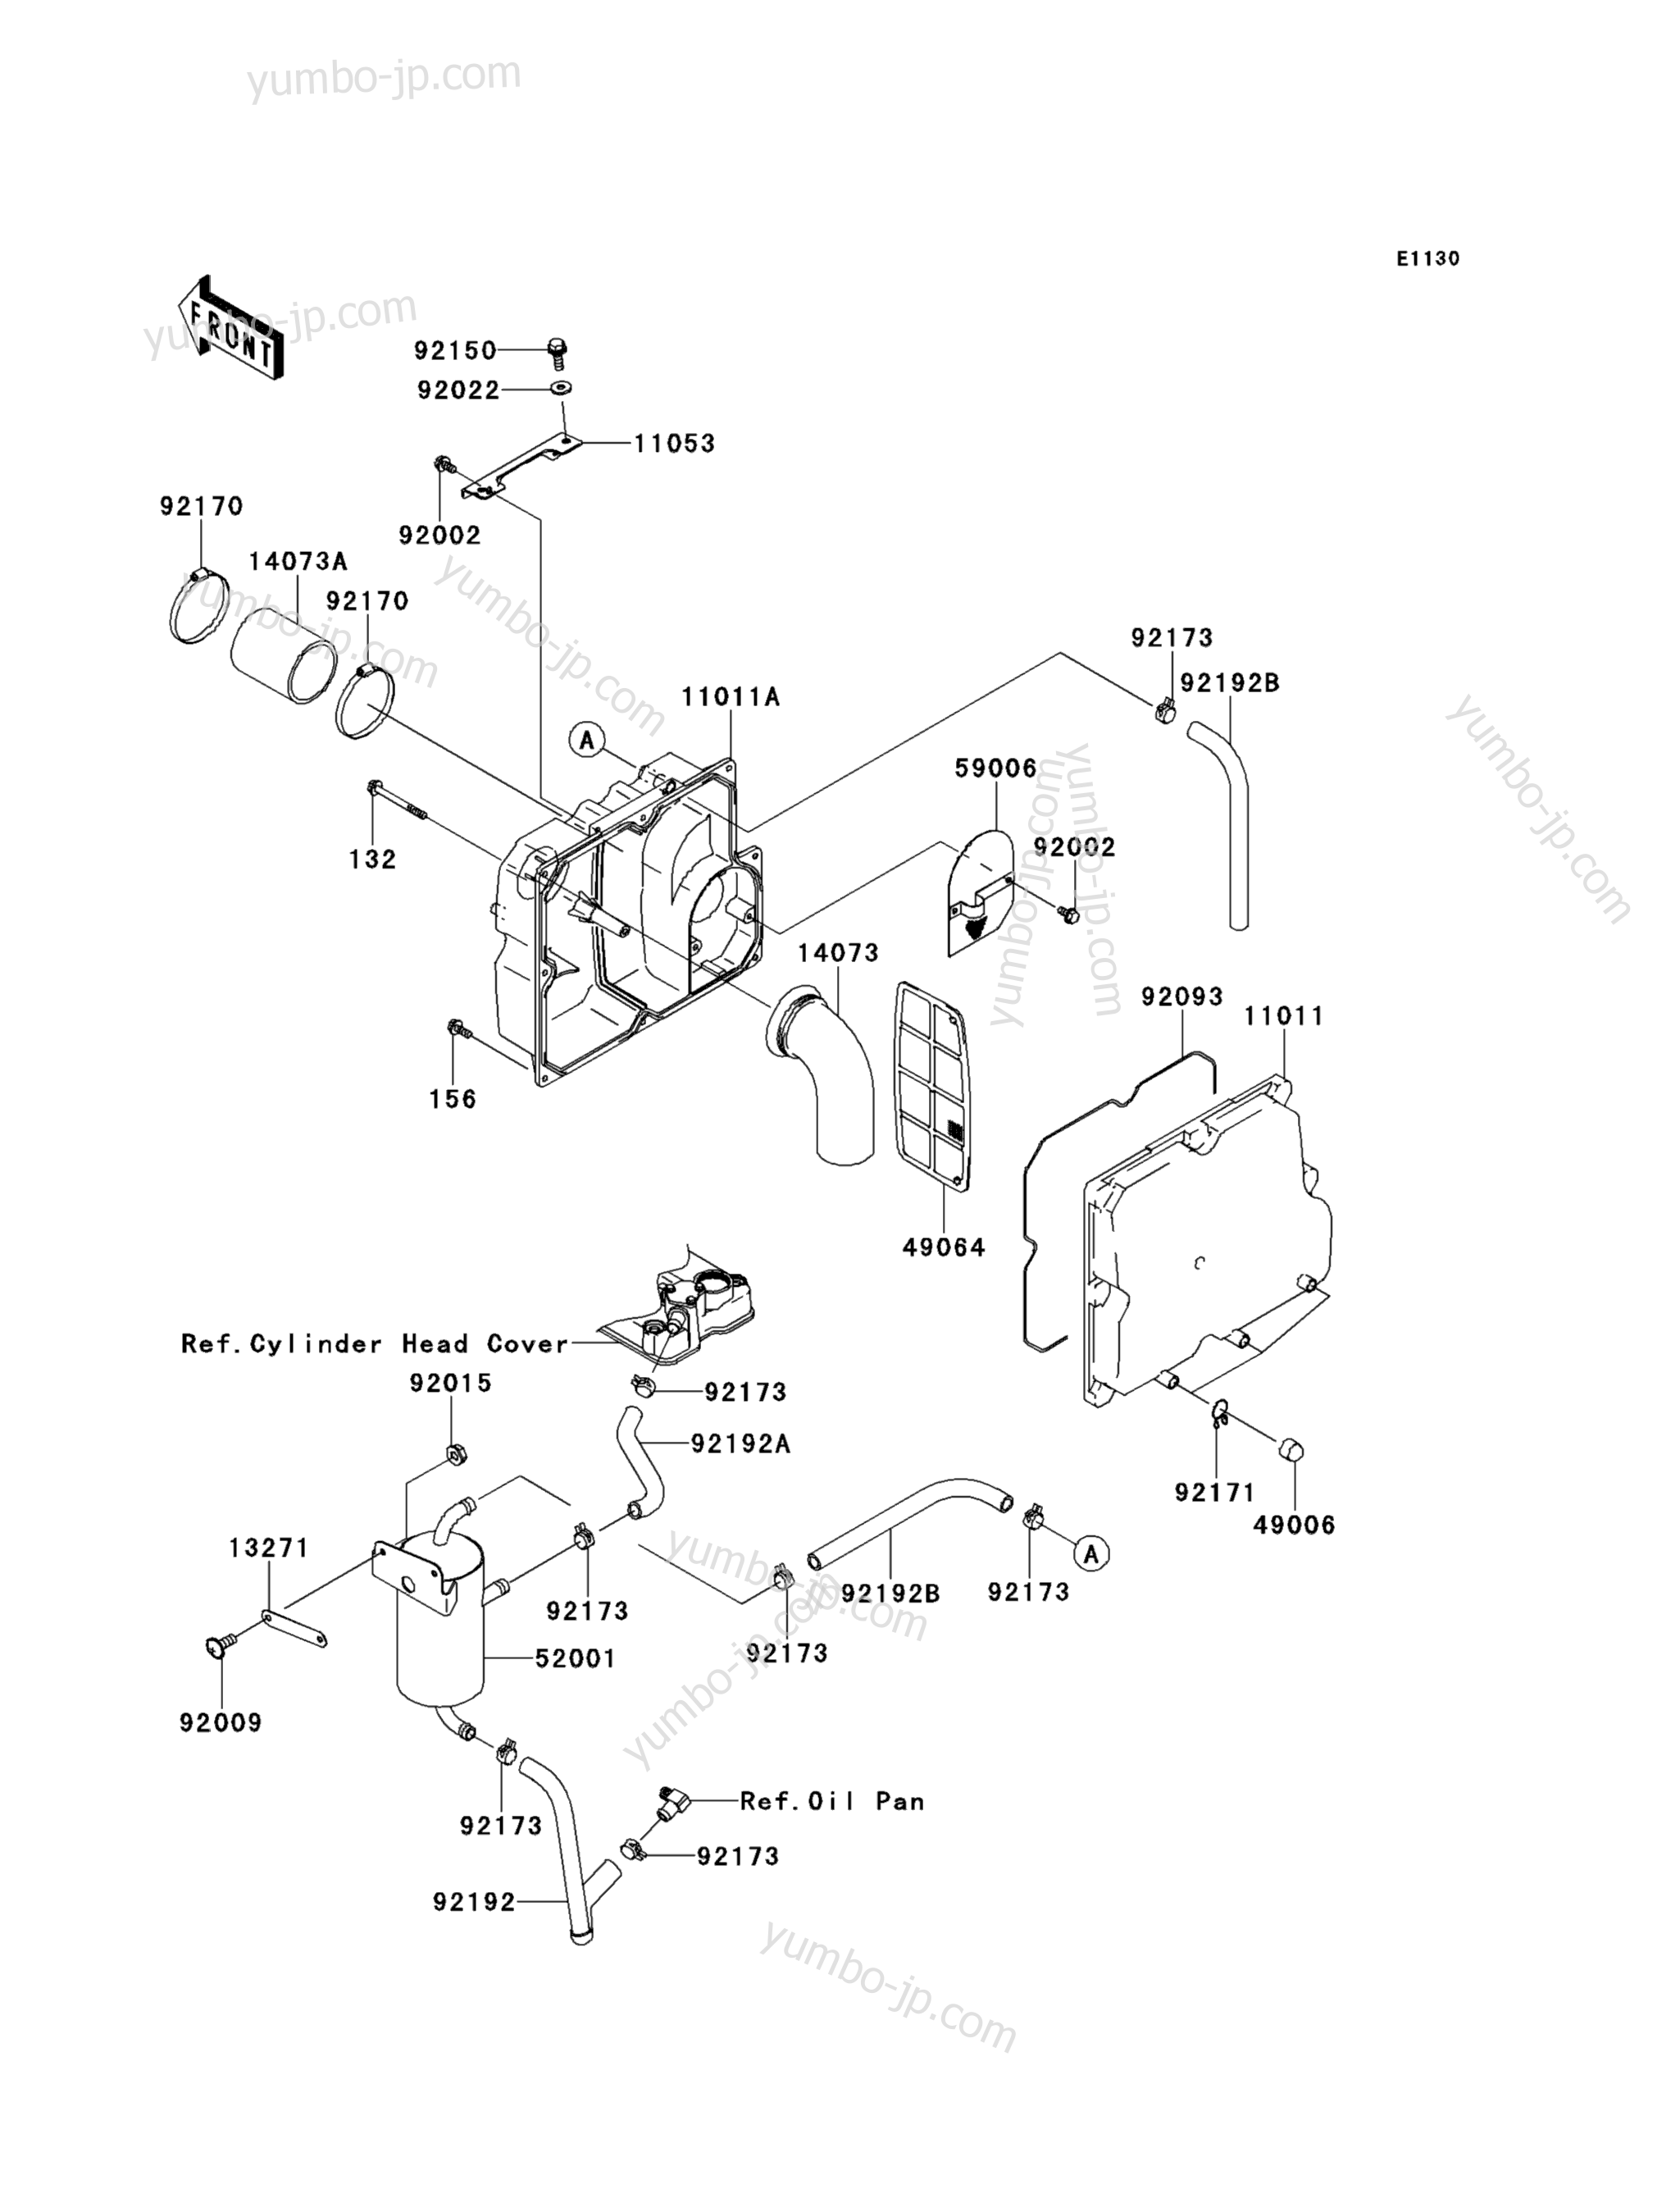 Intake Silencer для гидроциклов KAWASAKI JET SKI STX-15F (JT1500ADF) 2013 г.